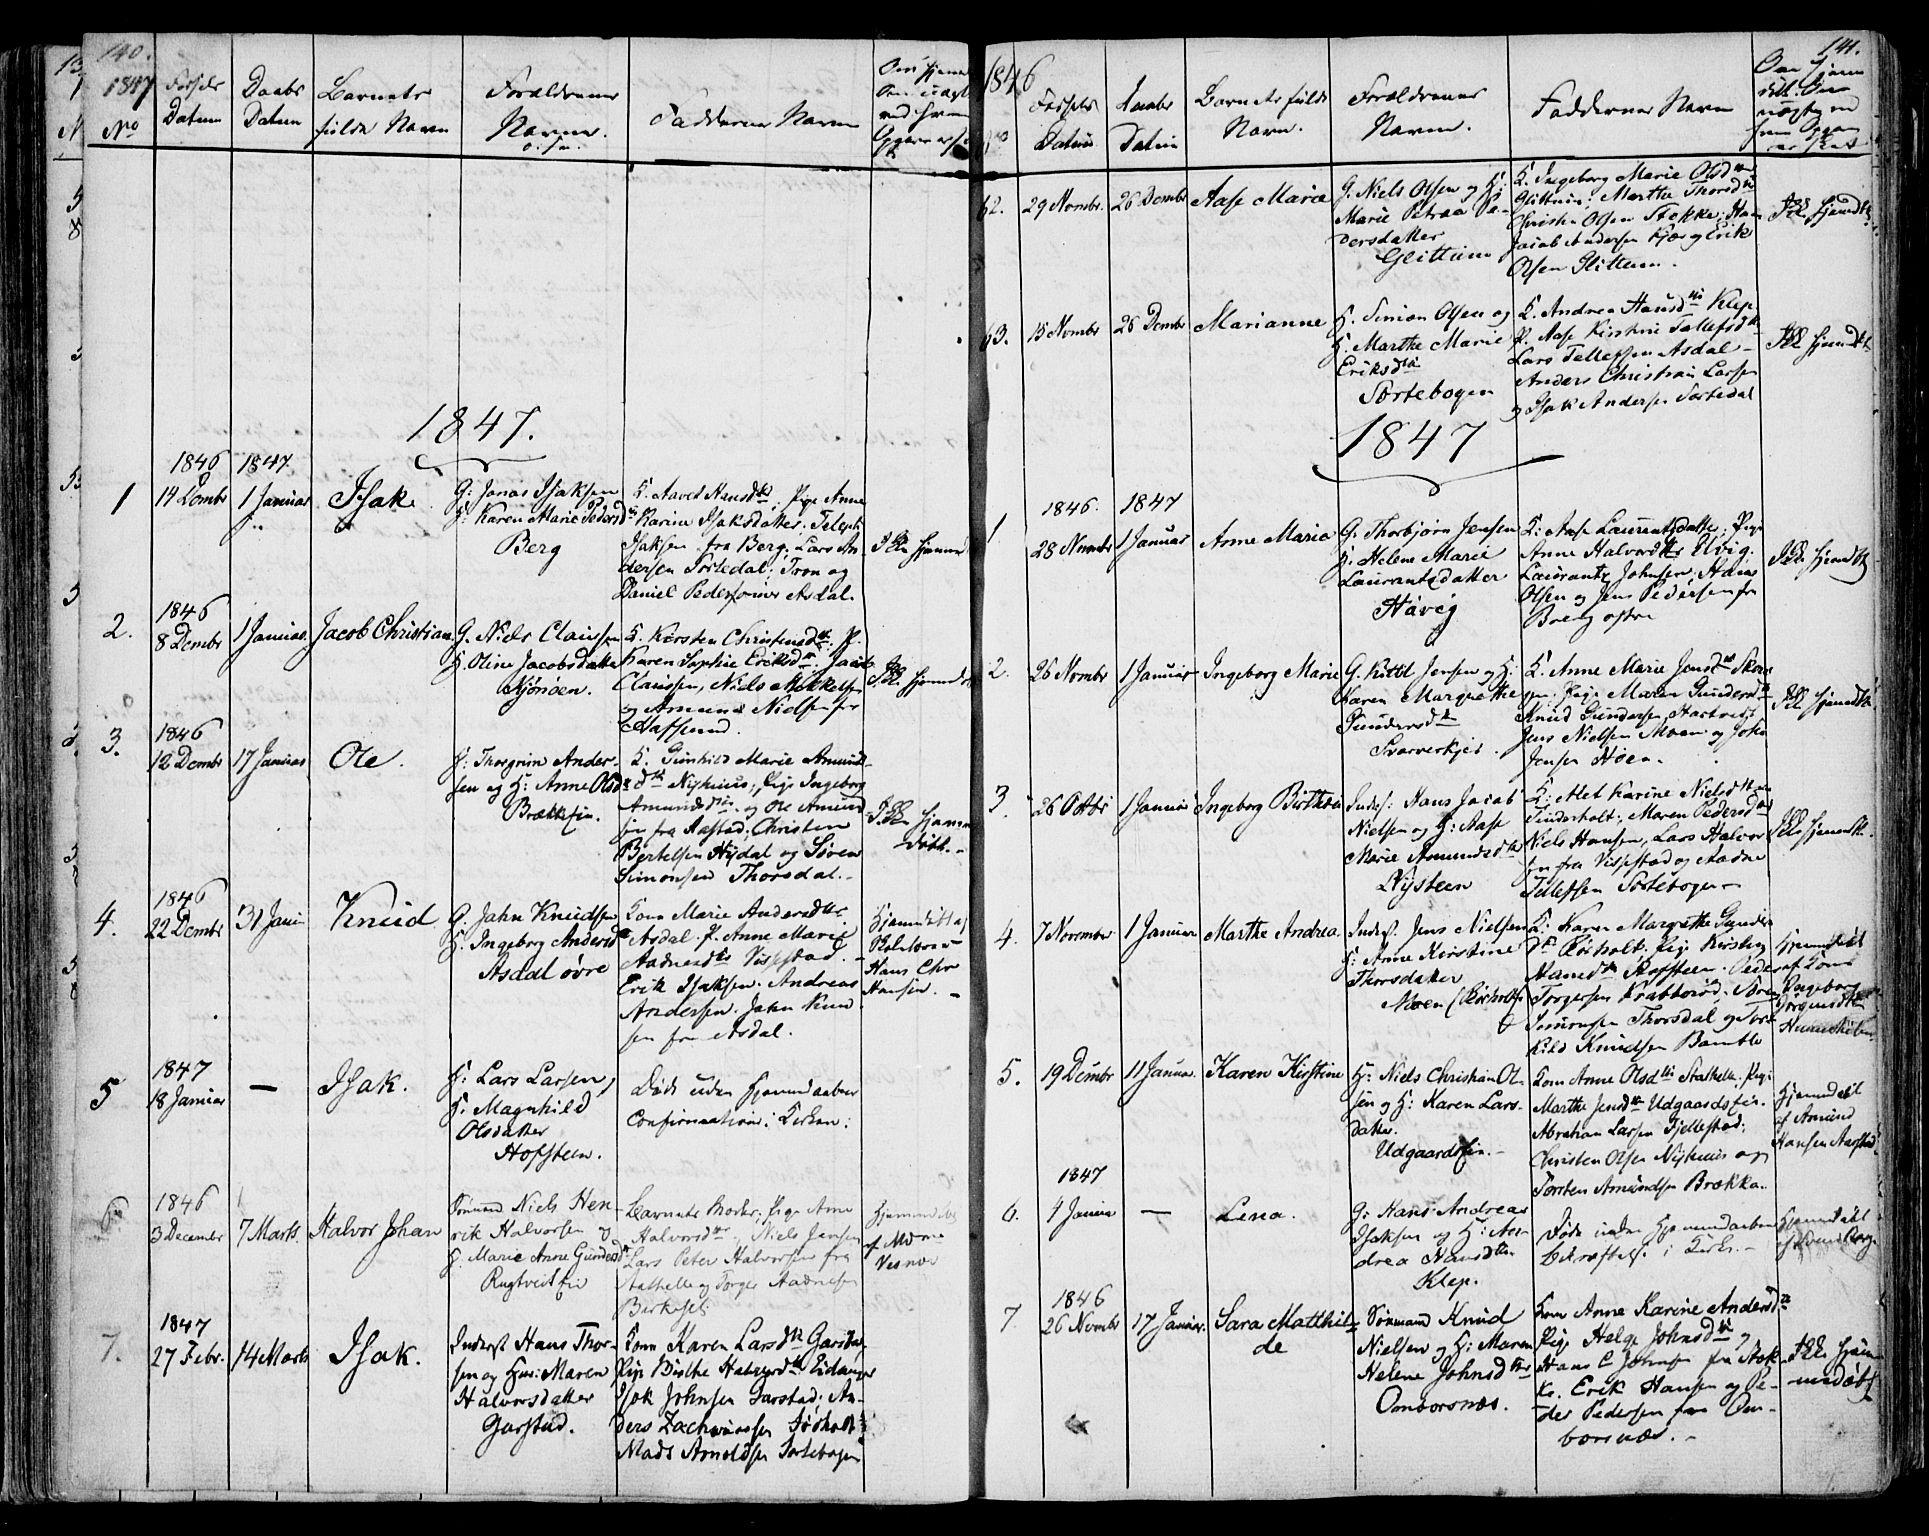 SAKO, Bamble kirkebøker, F/Fa/L0004: Ministerialbok nr. I 4, 1834-1853, s. 140-141